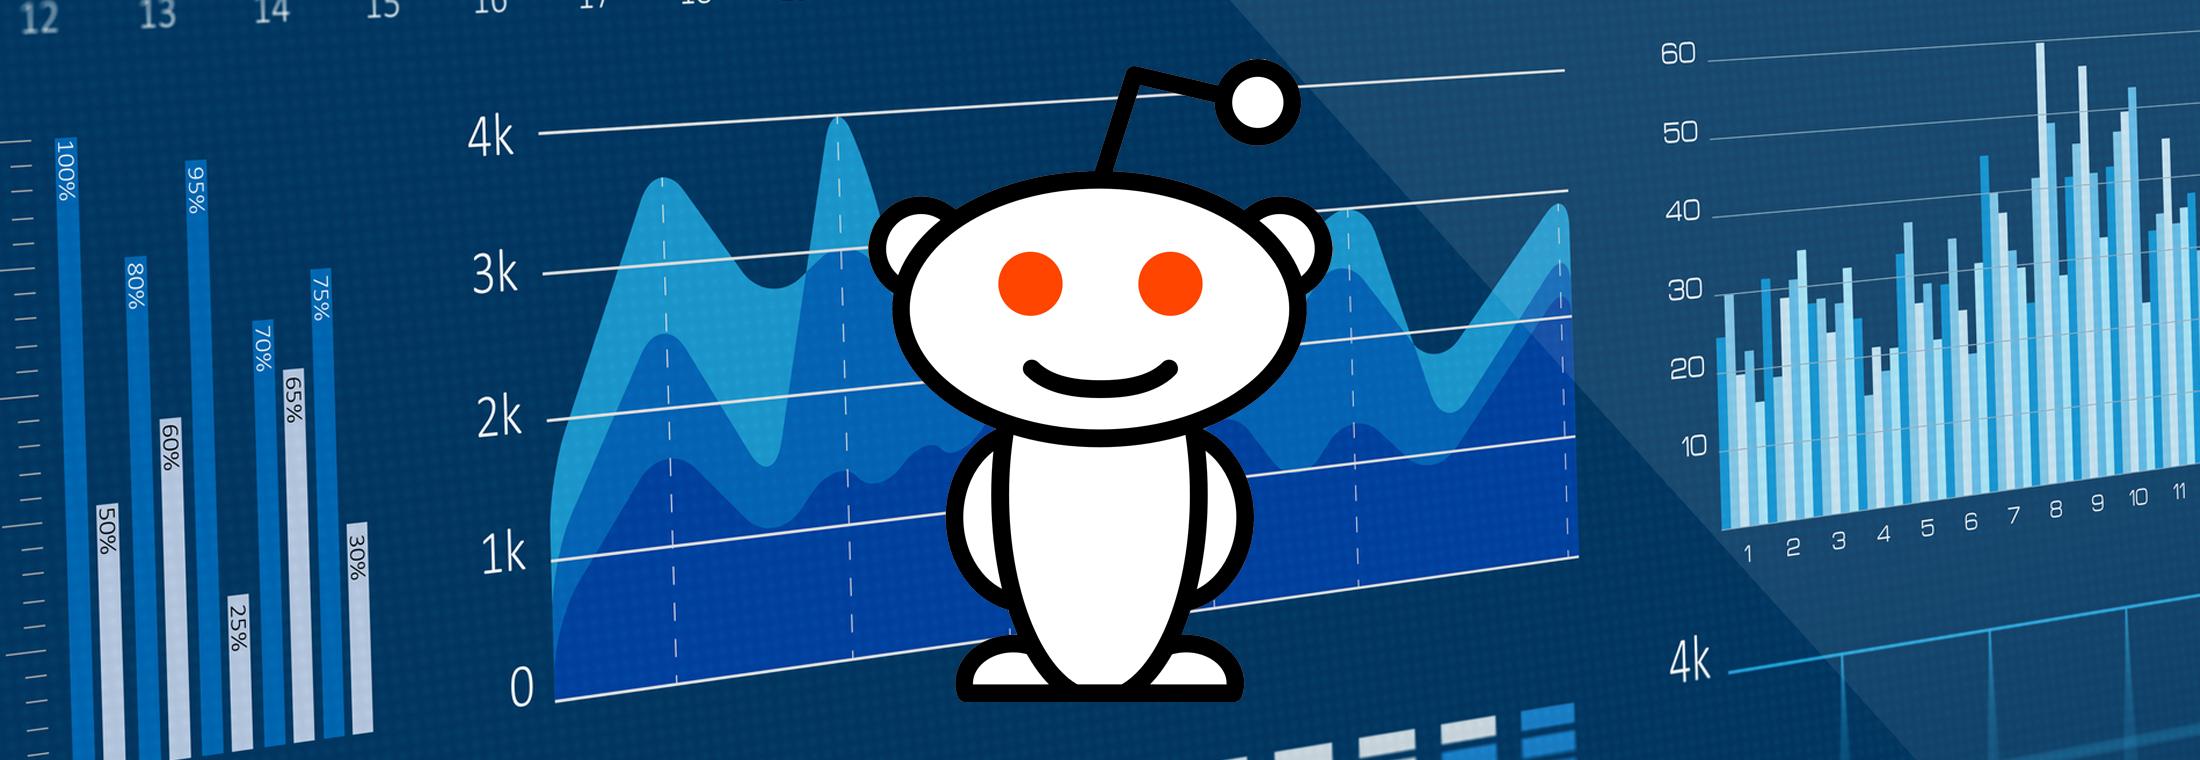 Best Anime Porn Subreddit subreddit analytics: the top six tools | brandwatch